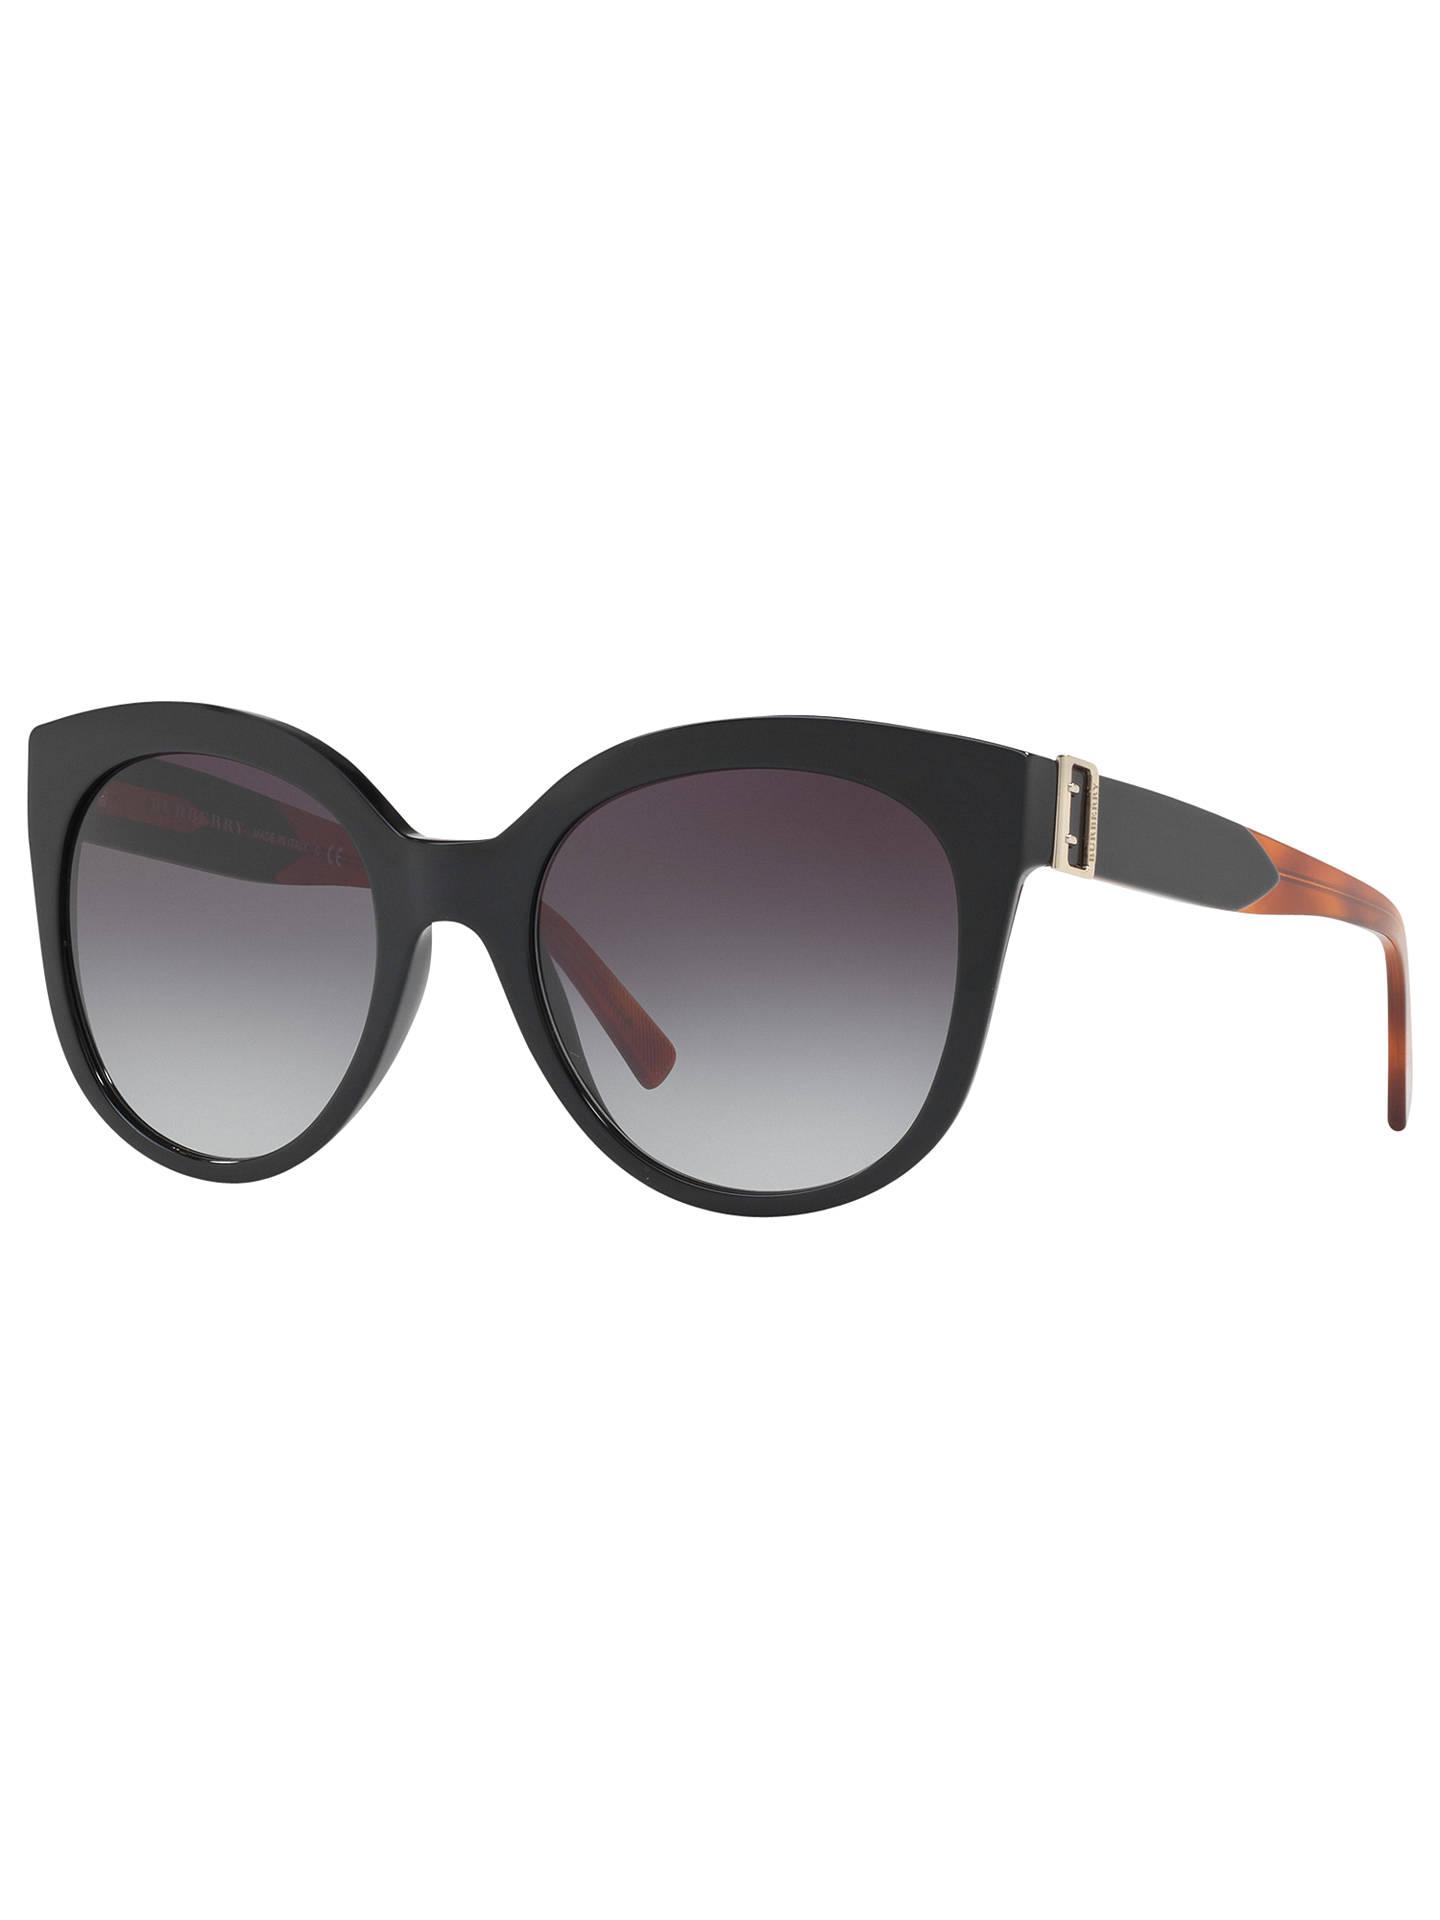 b4c555a3f54 Buy Burberry BE4243 Cat s Eye Sunglasses